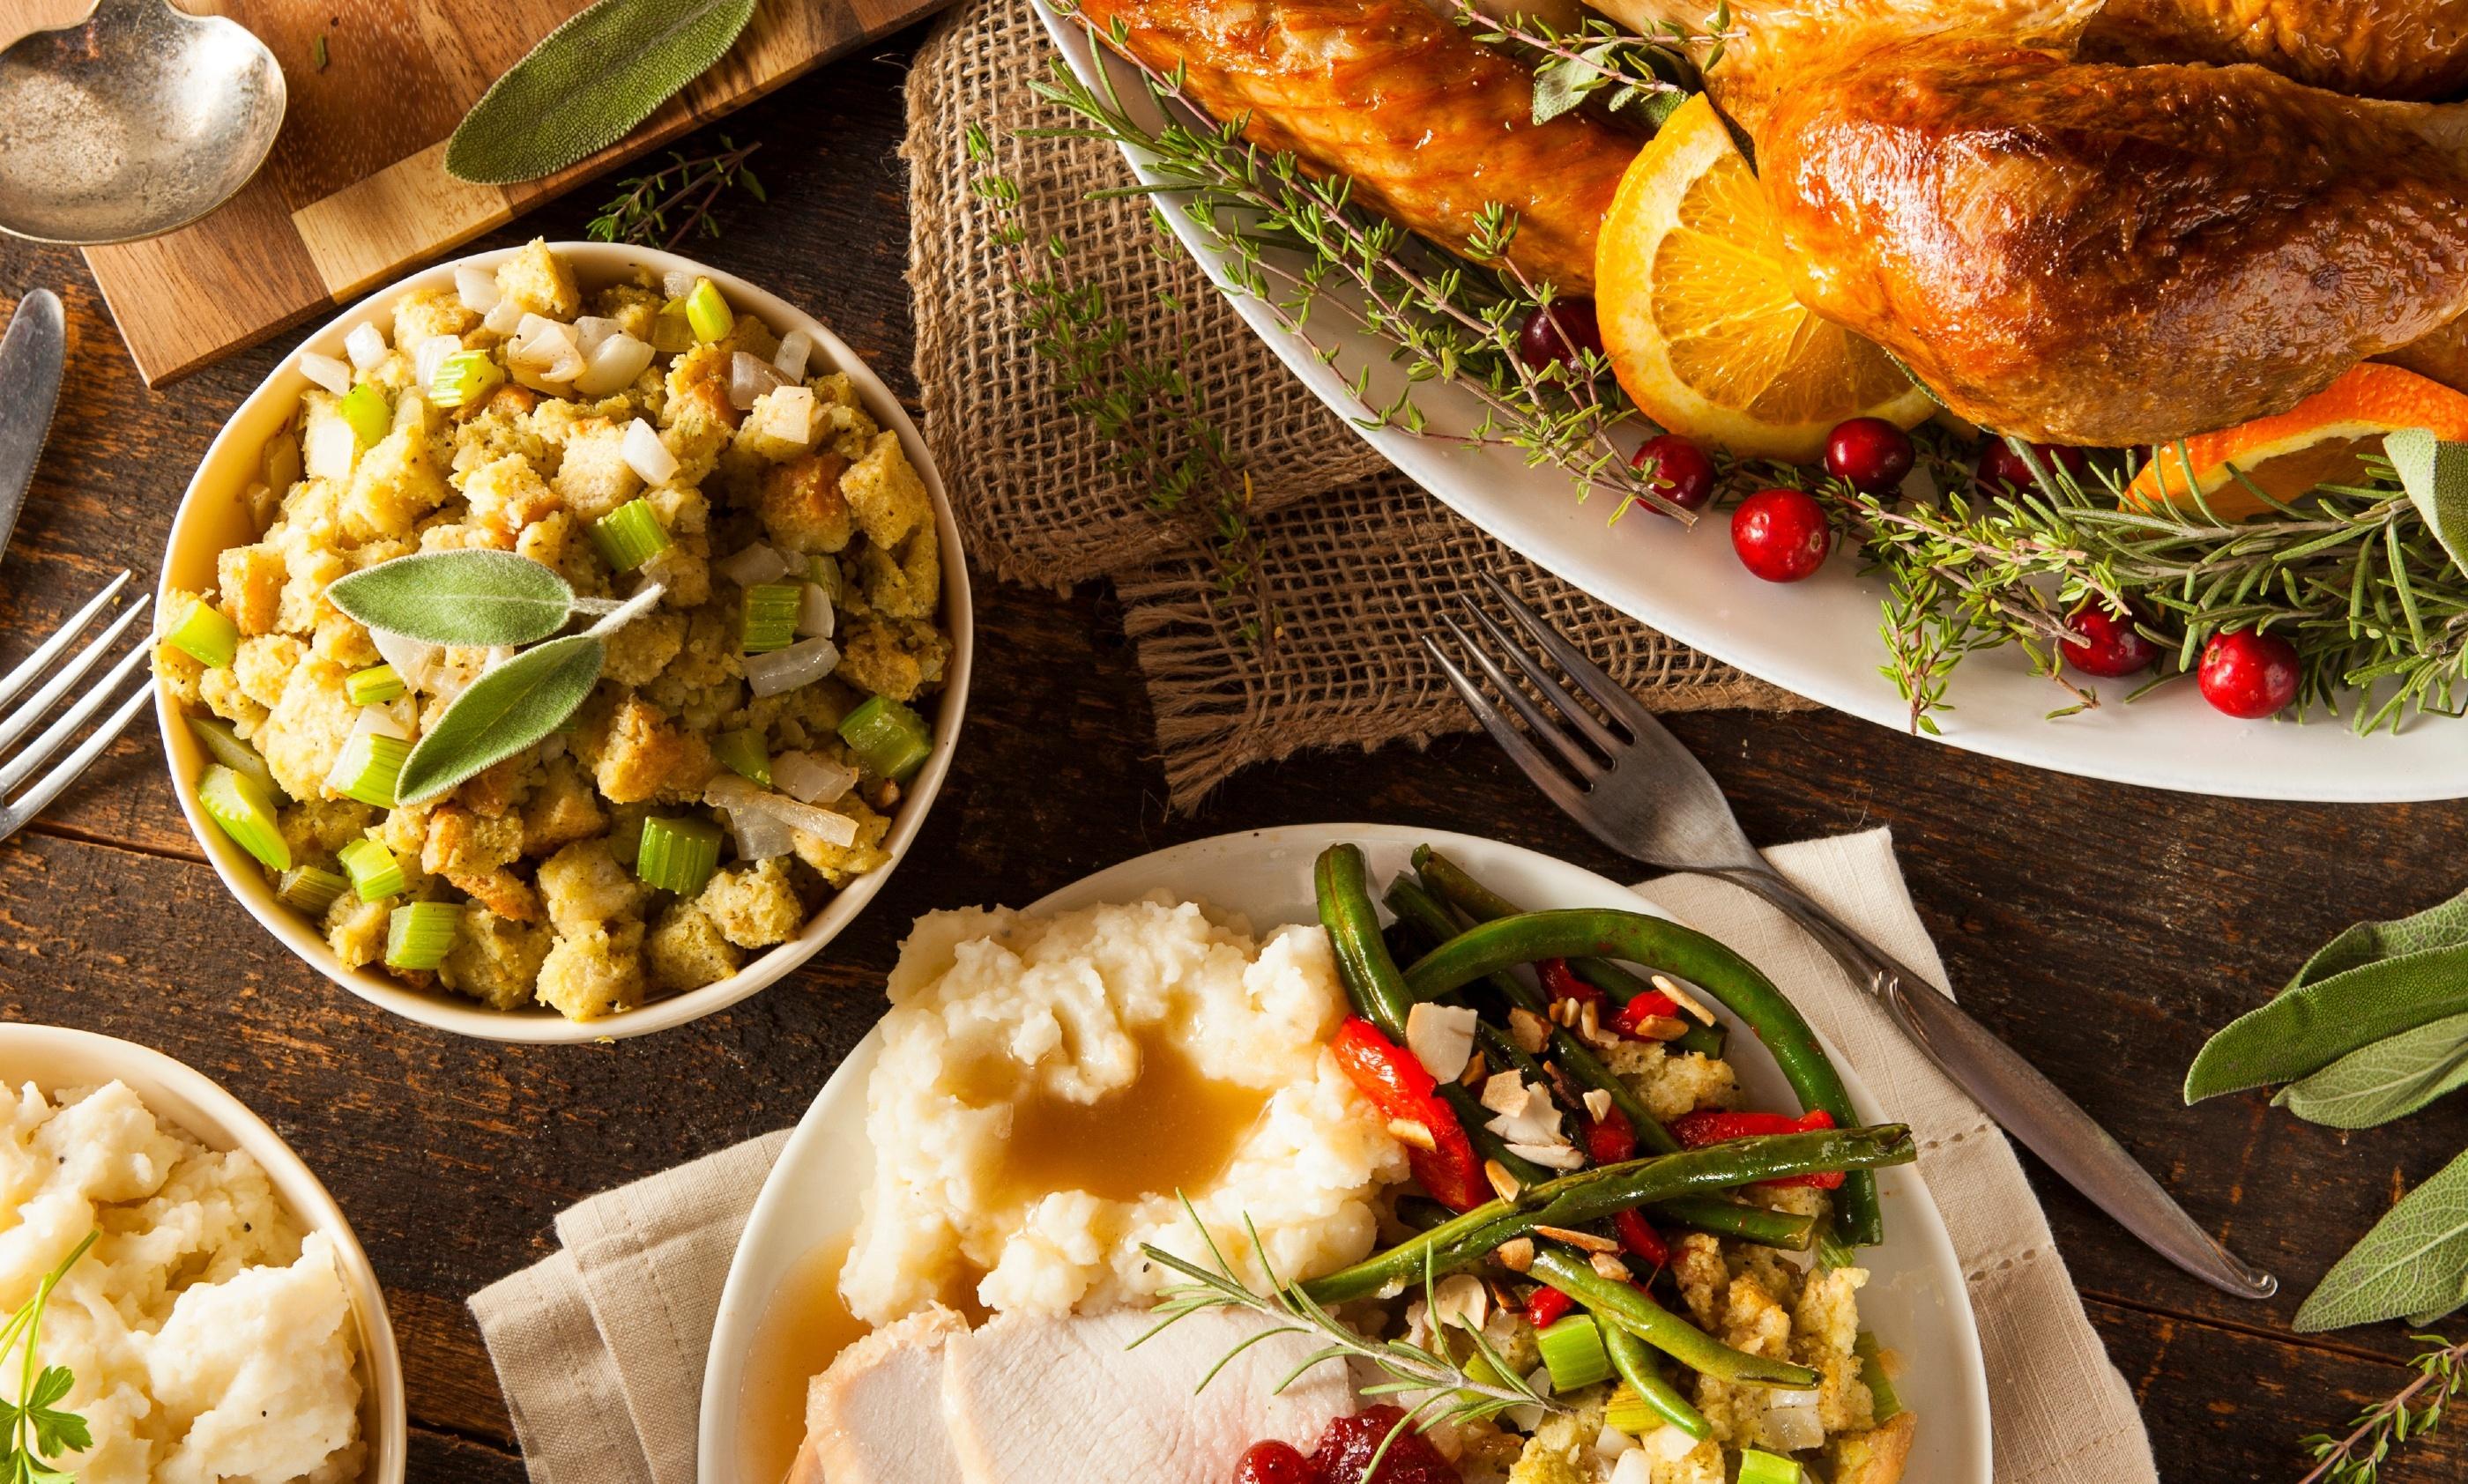 Turkey_Dinner_case_study.jpg